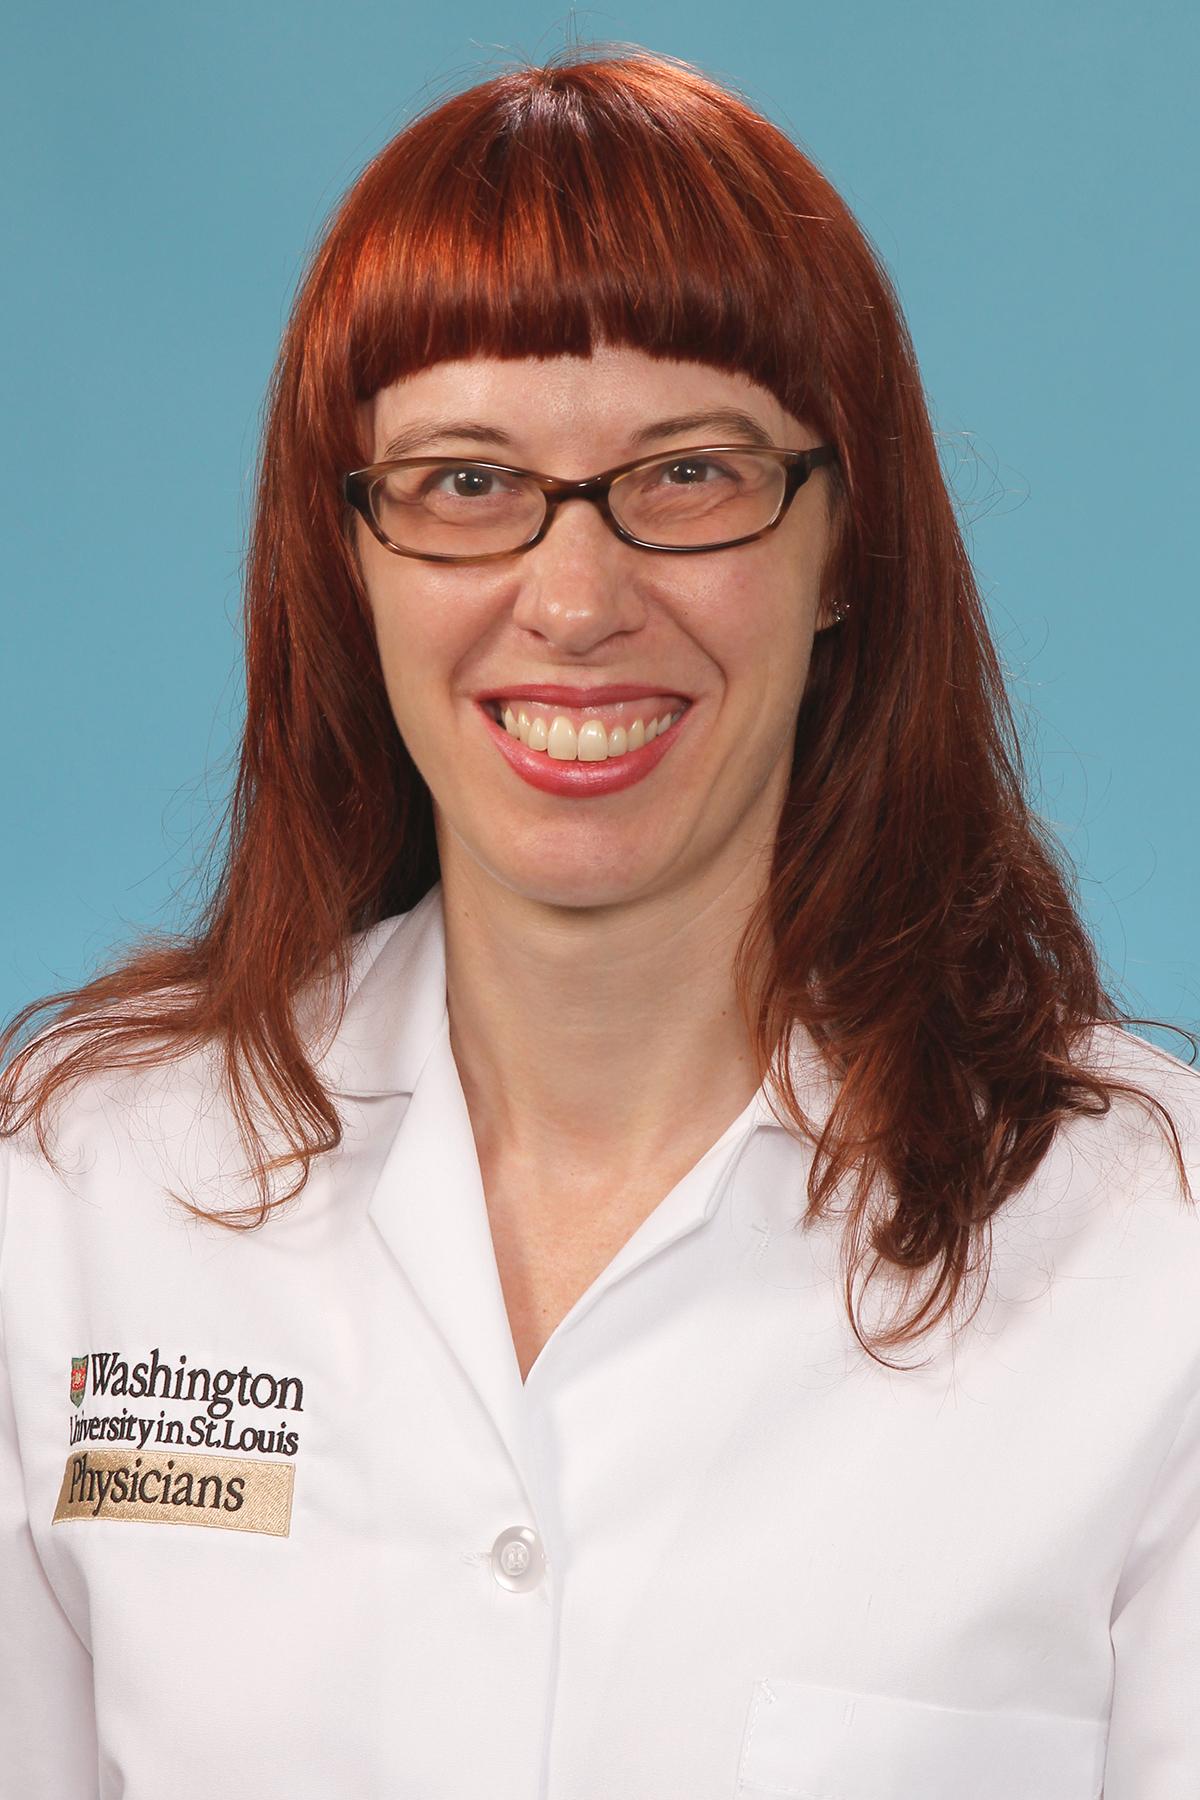 Paetra Ruddy Md Division Of Dermatology Washington